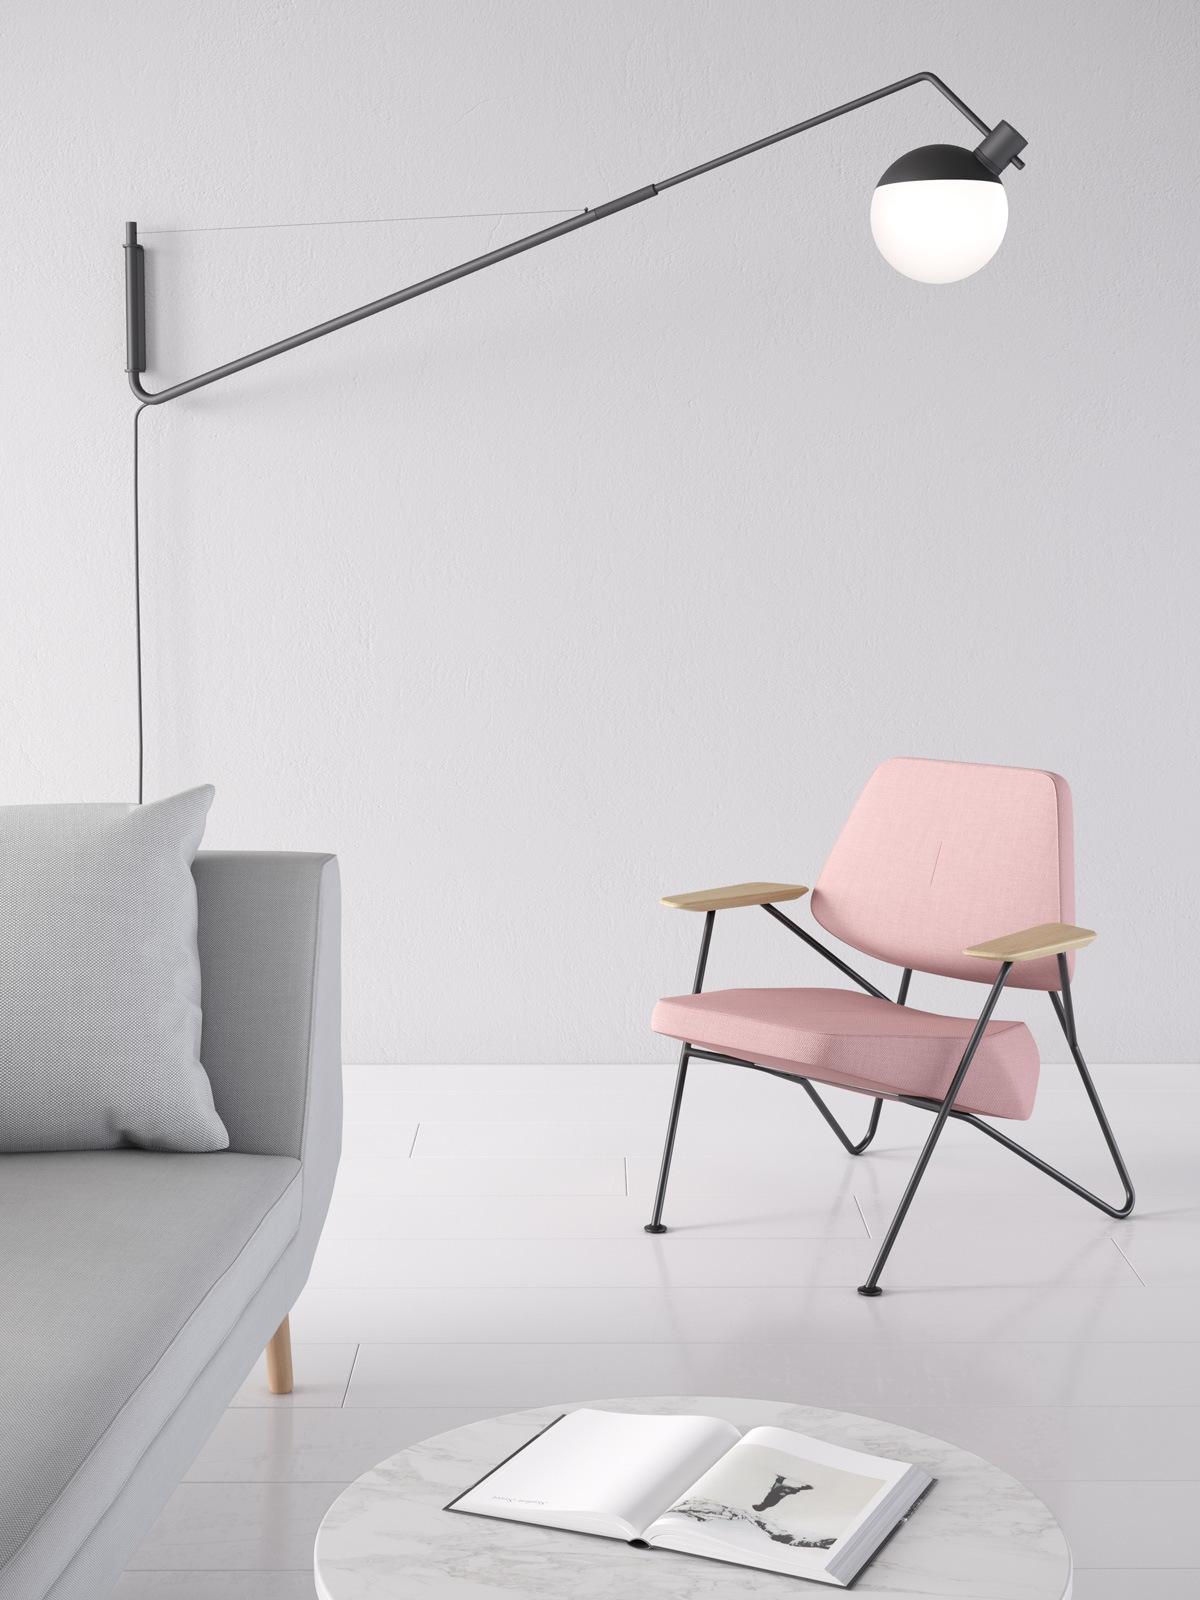 Baluna W Large Wandleuchte Grupa Products DesignOrt Lampen Berlin Onlineshop